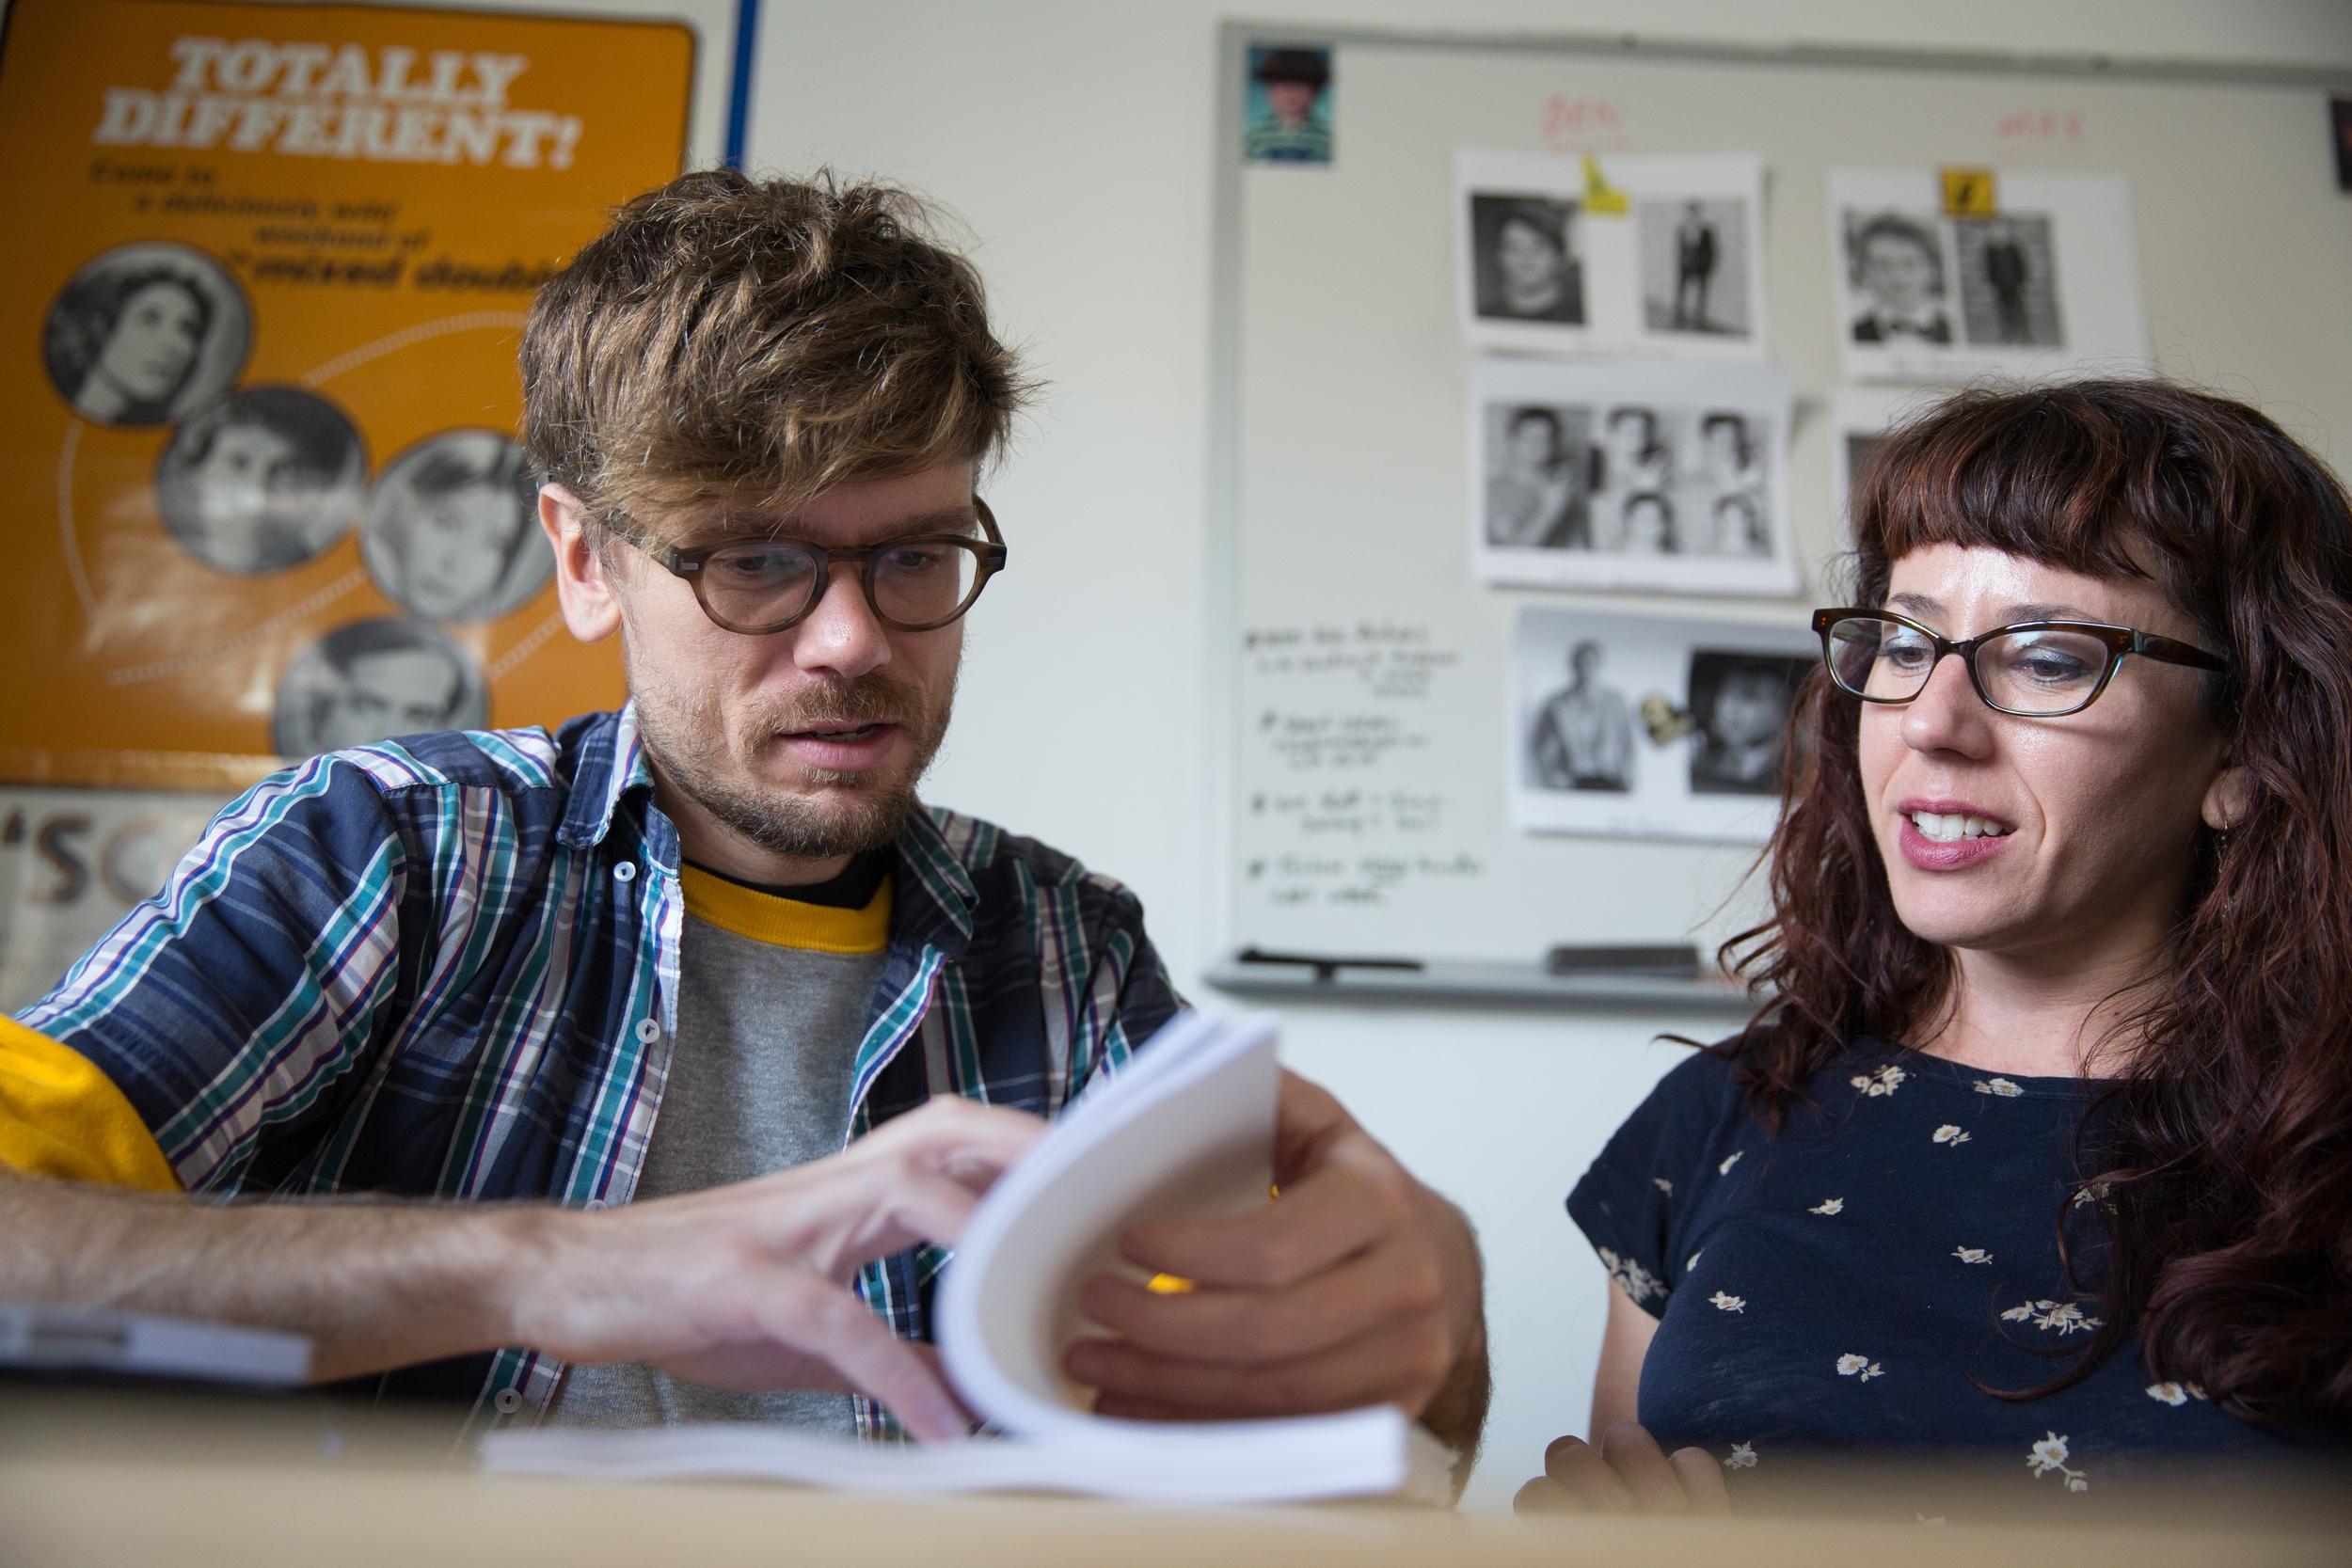 Travis Mathews with FilmHouse Manager Amanda Todd. Photo by Erin Lubin.